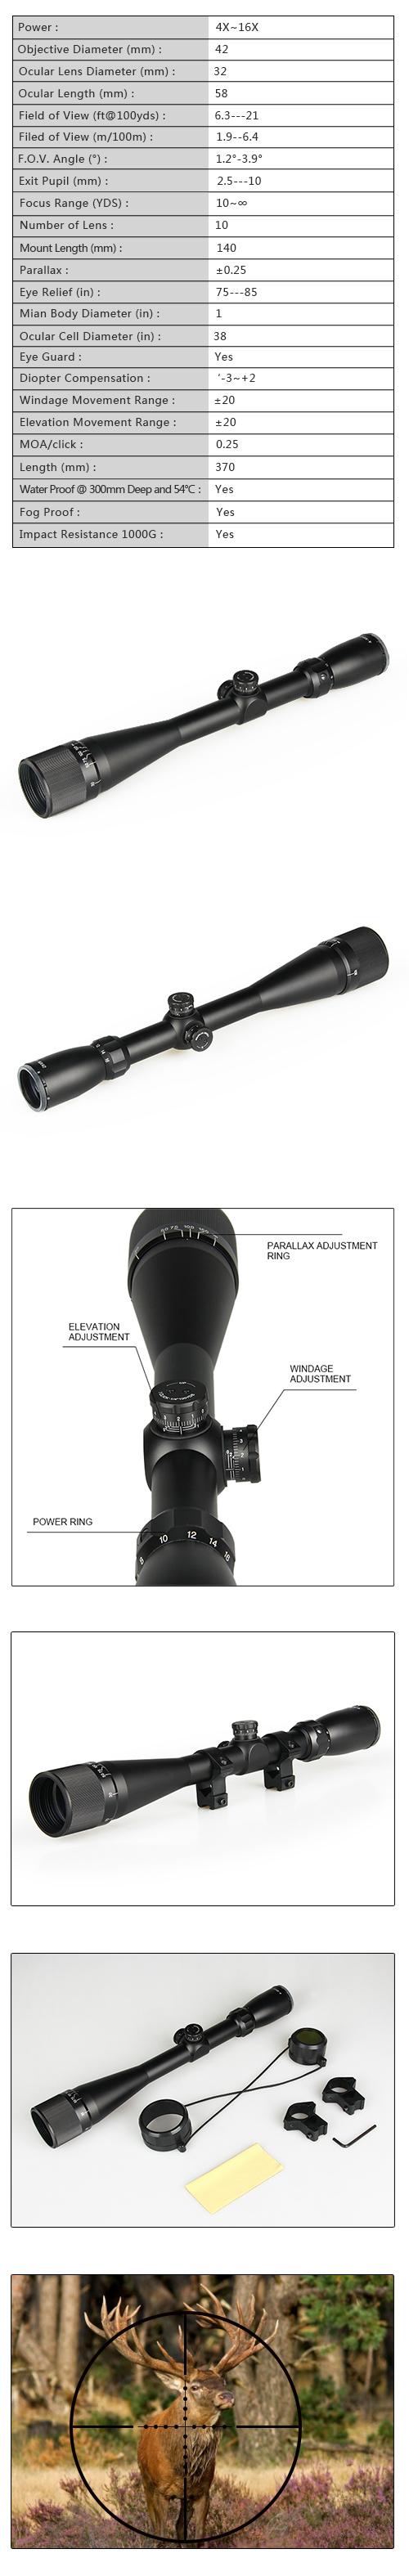 fiber optic rifle scope - scope bubble level-HAIKE OUTDOOR